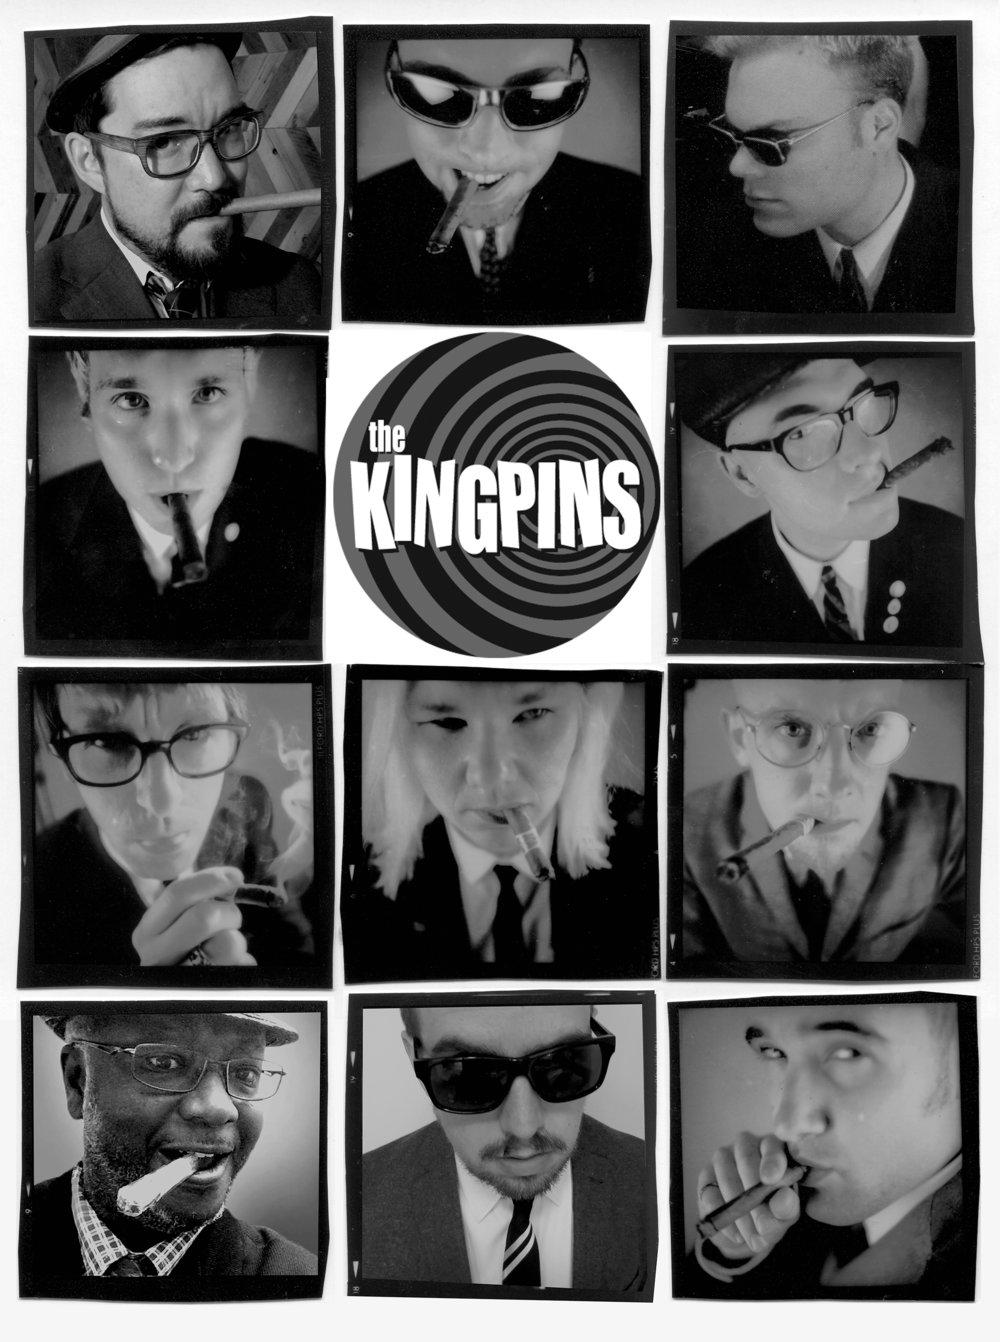 The Kingpins 2017 press_shot_01 with logo.jpg